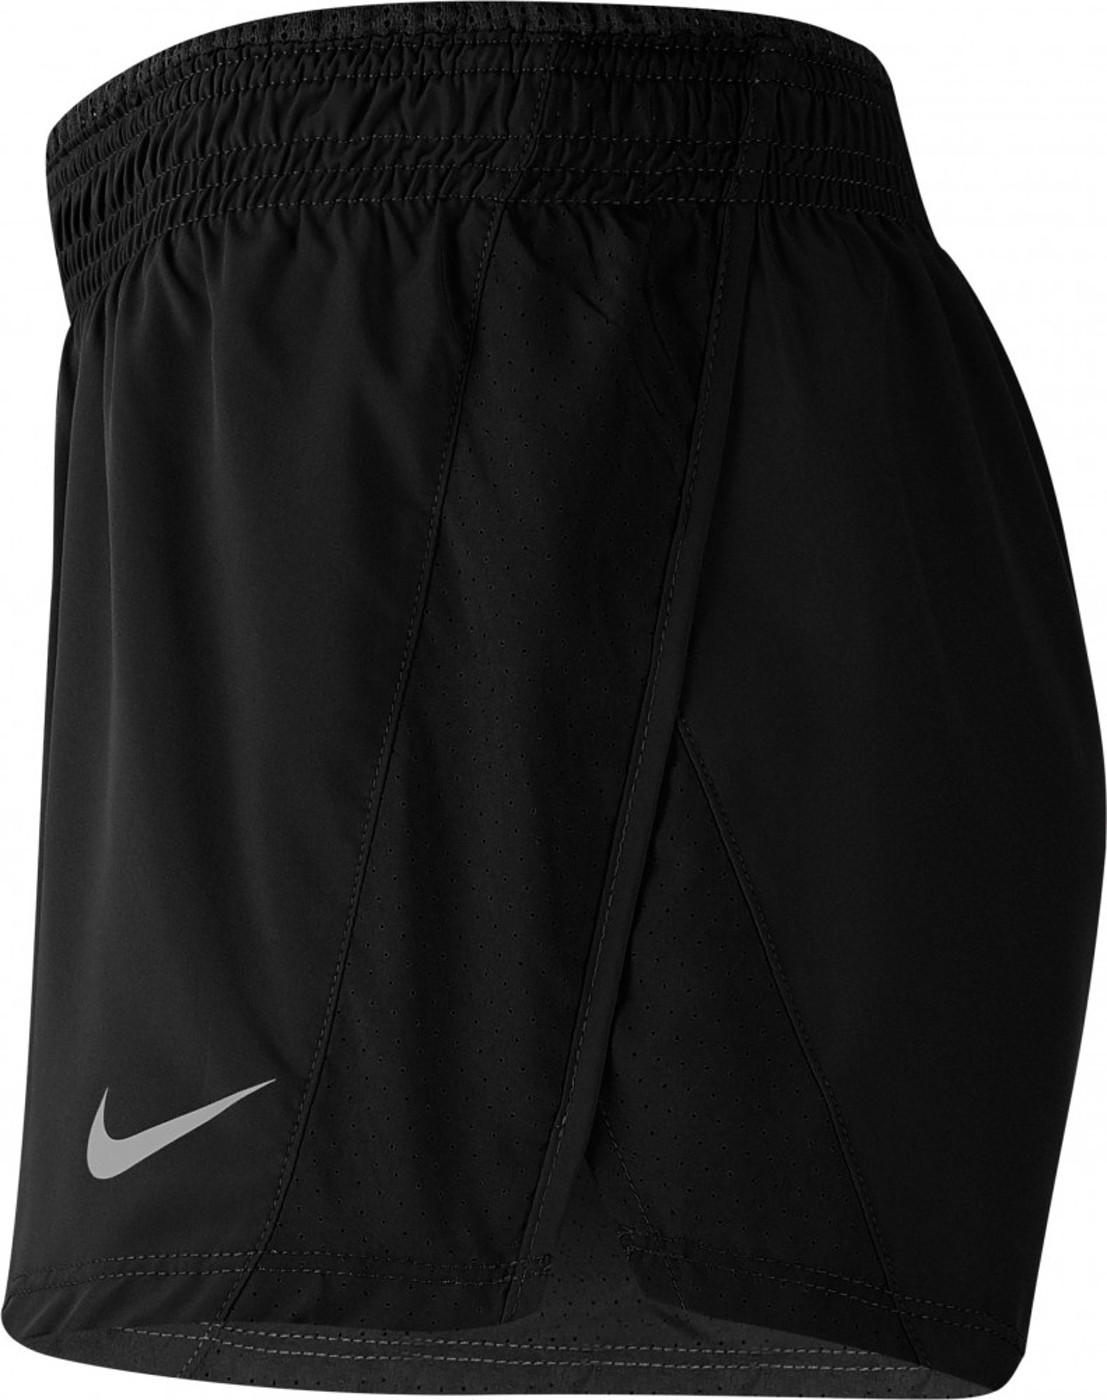 Nike 10K 2-In-1 Runnin - Damen